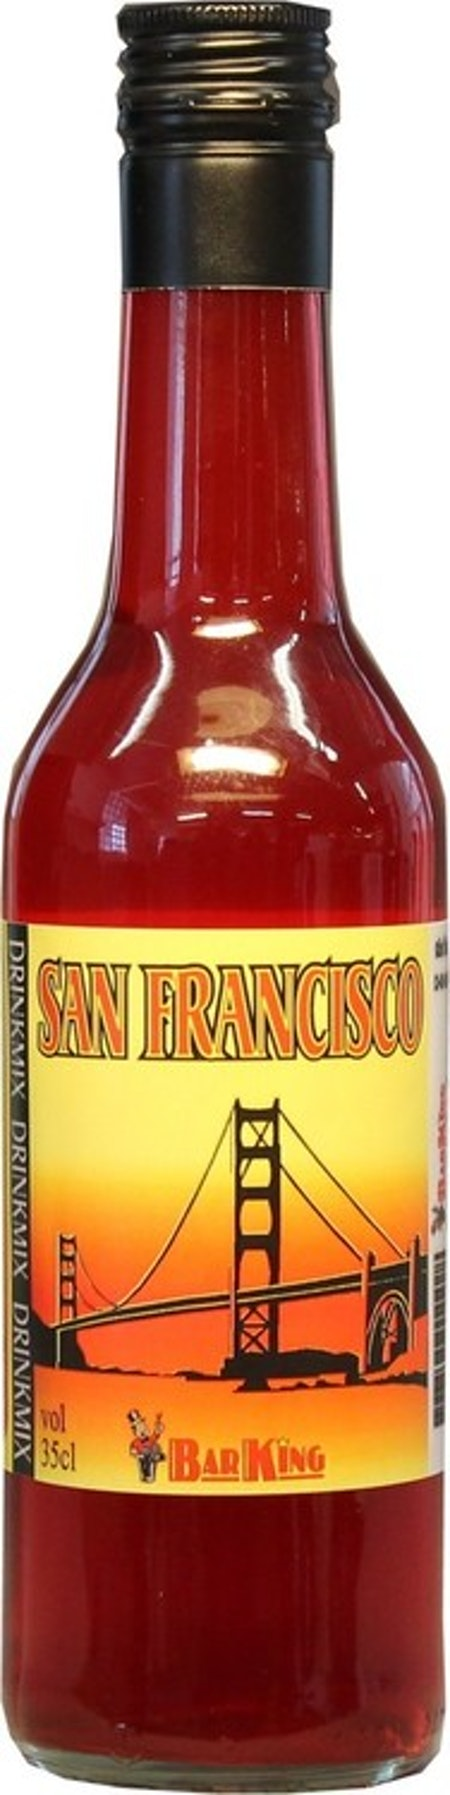 DRINKMIX / SAN FRANCISCO 35 CL